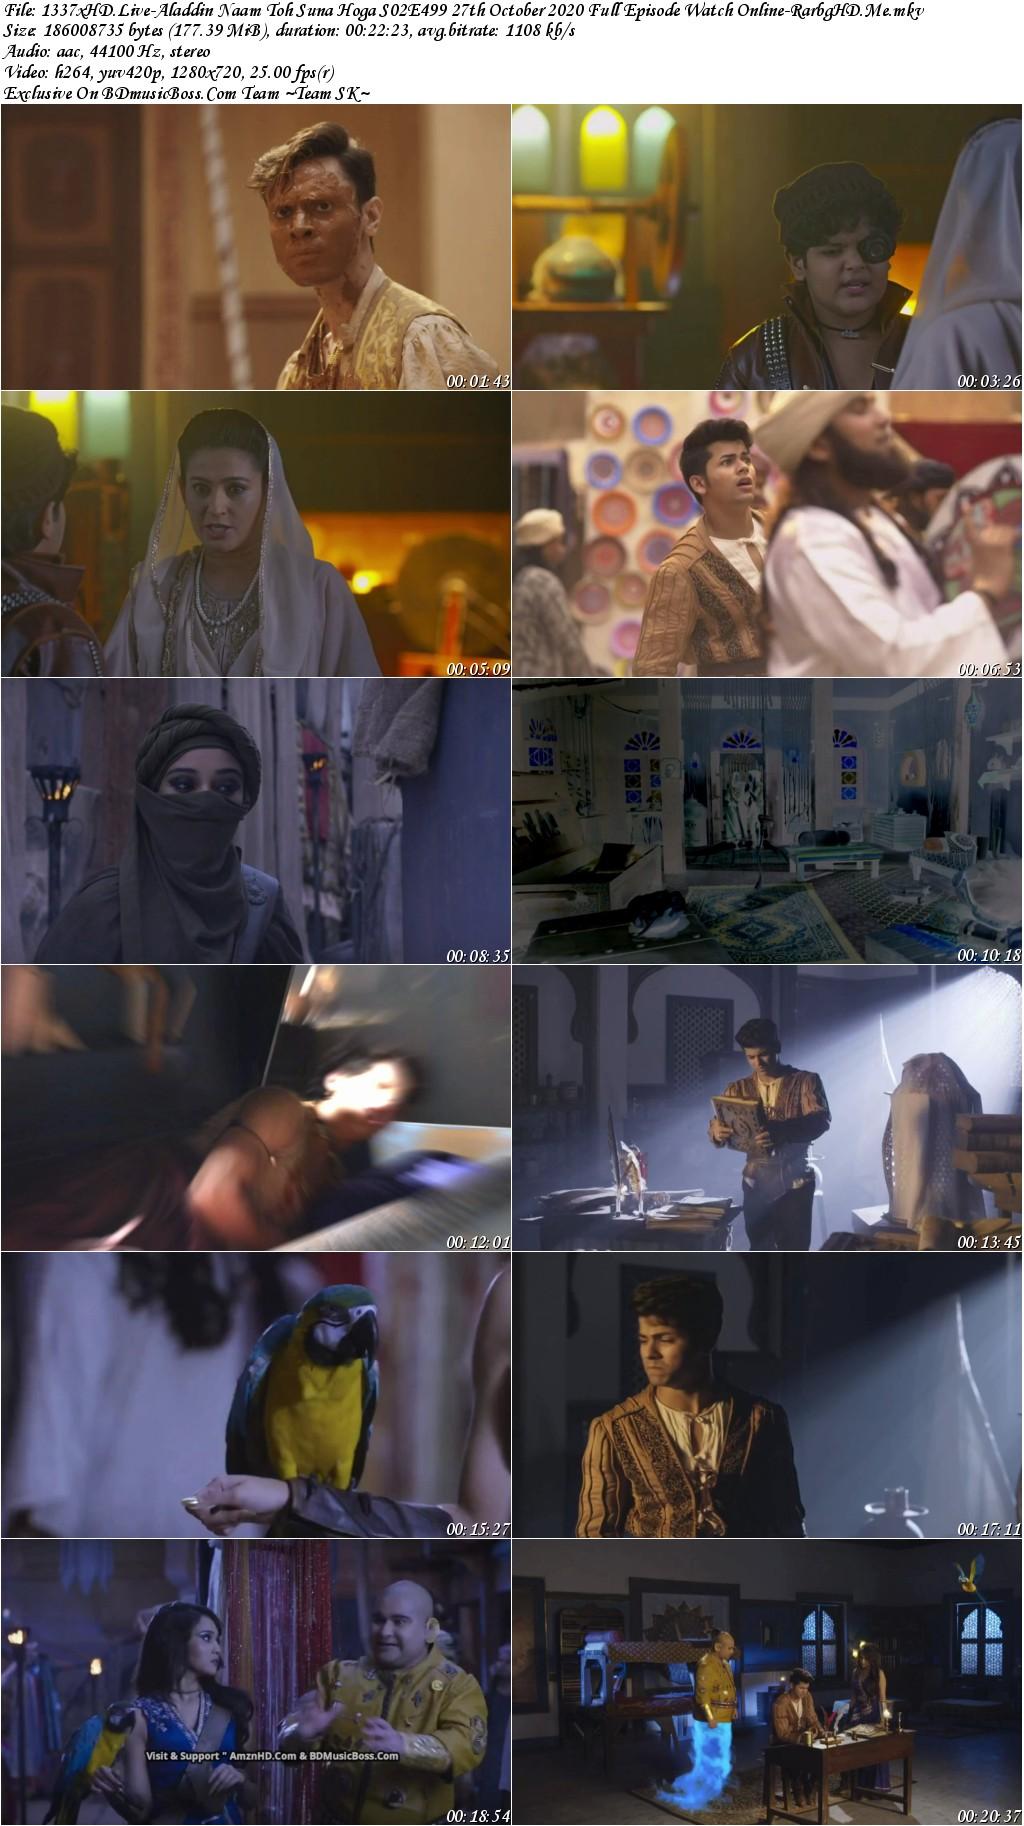 1337x-HD-Live-Aladdin-Naam-Toh-Suna-Hoga-S02-E499-27th-October-2020-Full-Episode-Watch-Online-Rarbg-